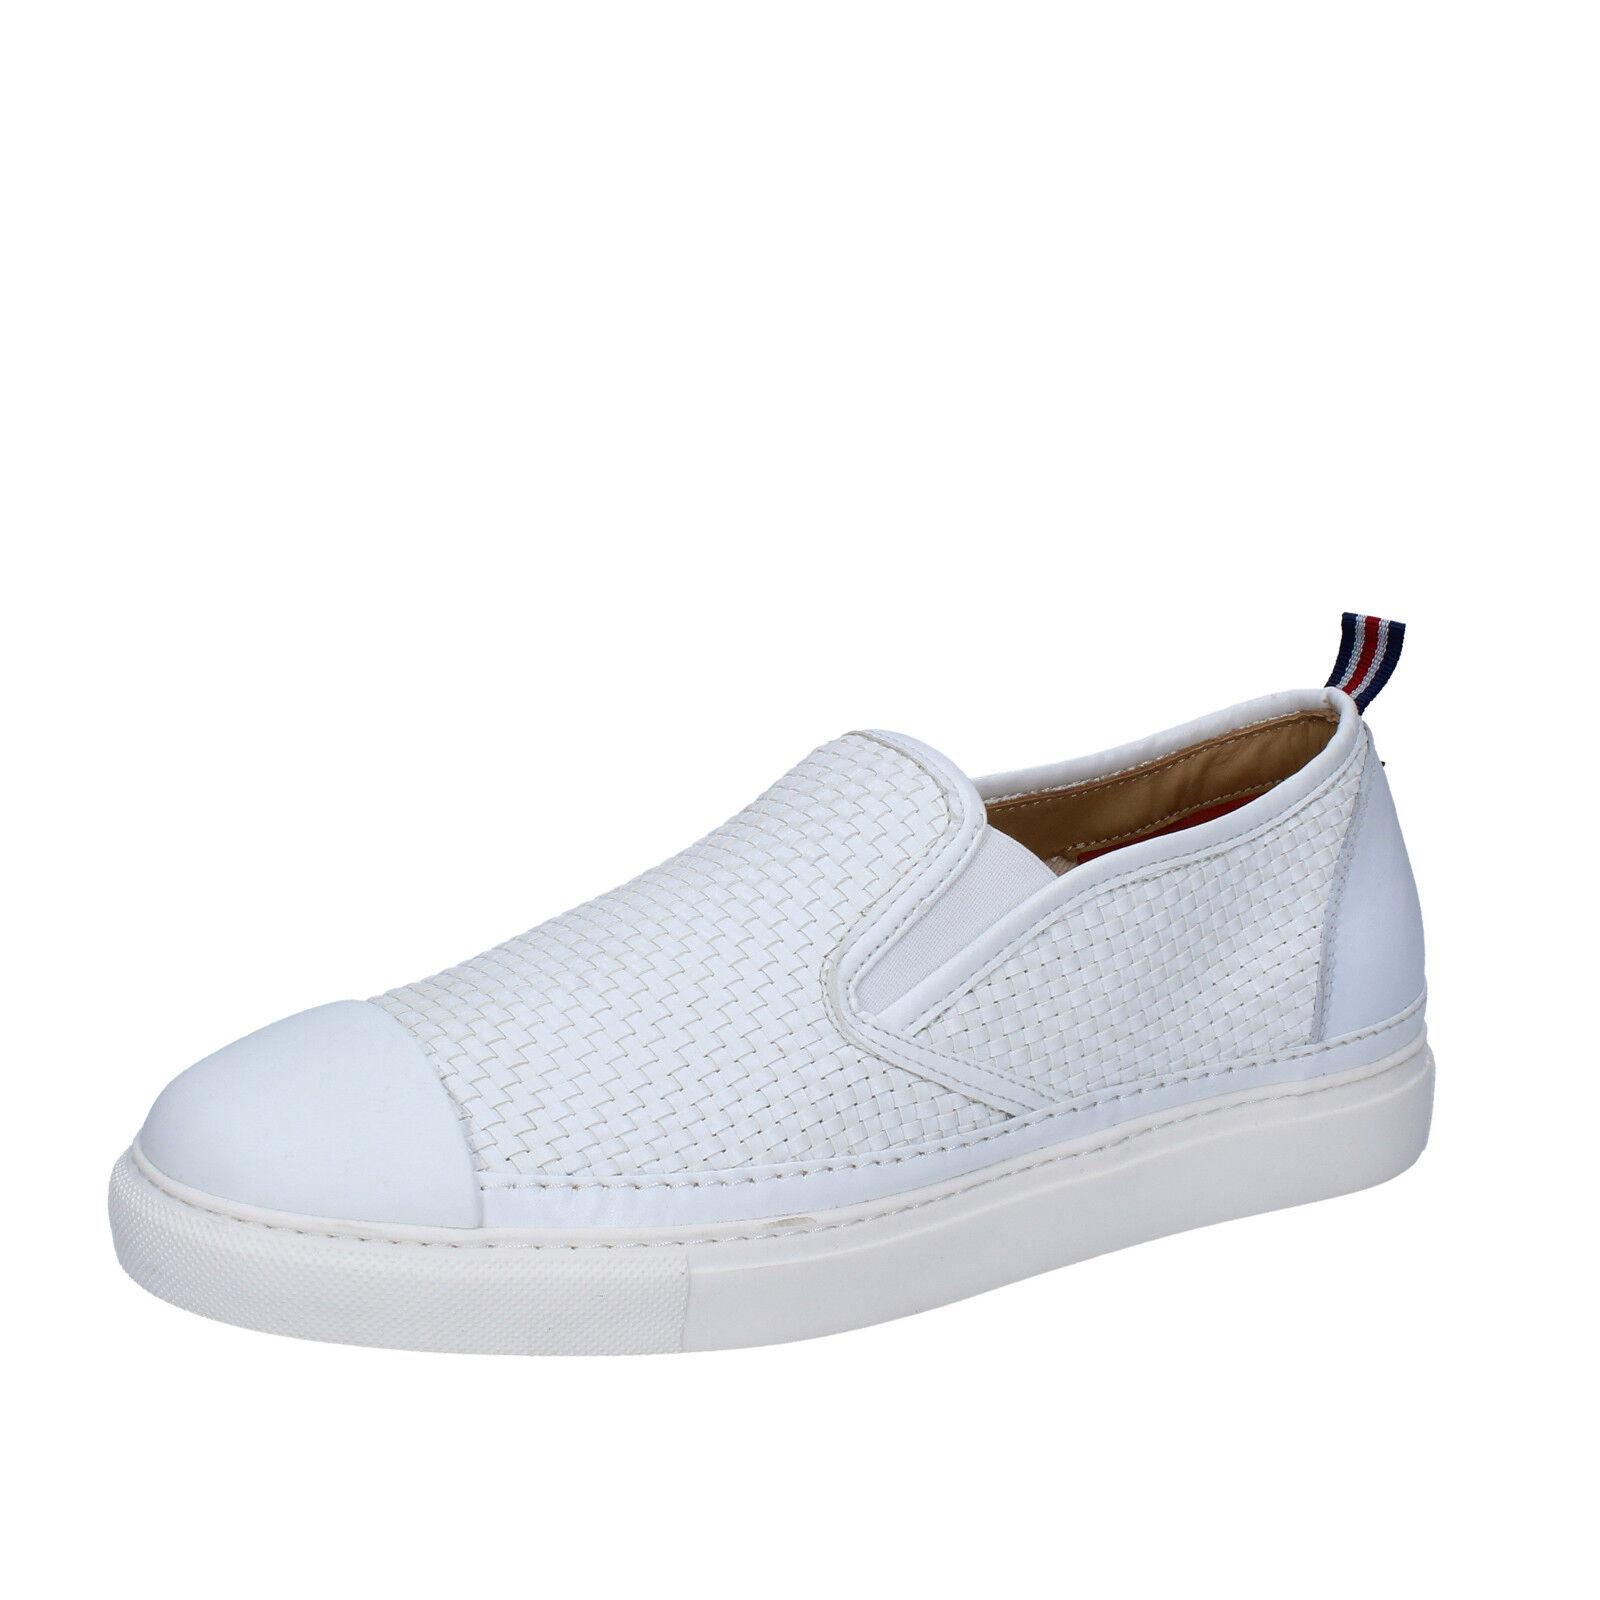 Mens shoes BRIMARTS 9 () slip on white leather BZ282-E